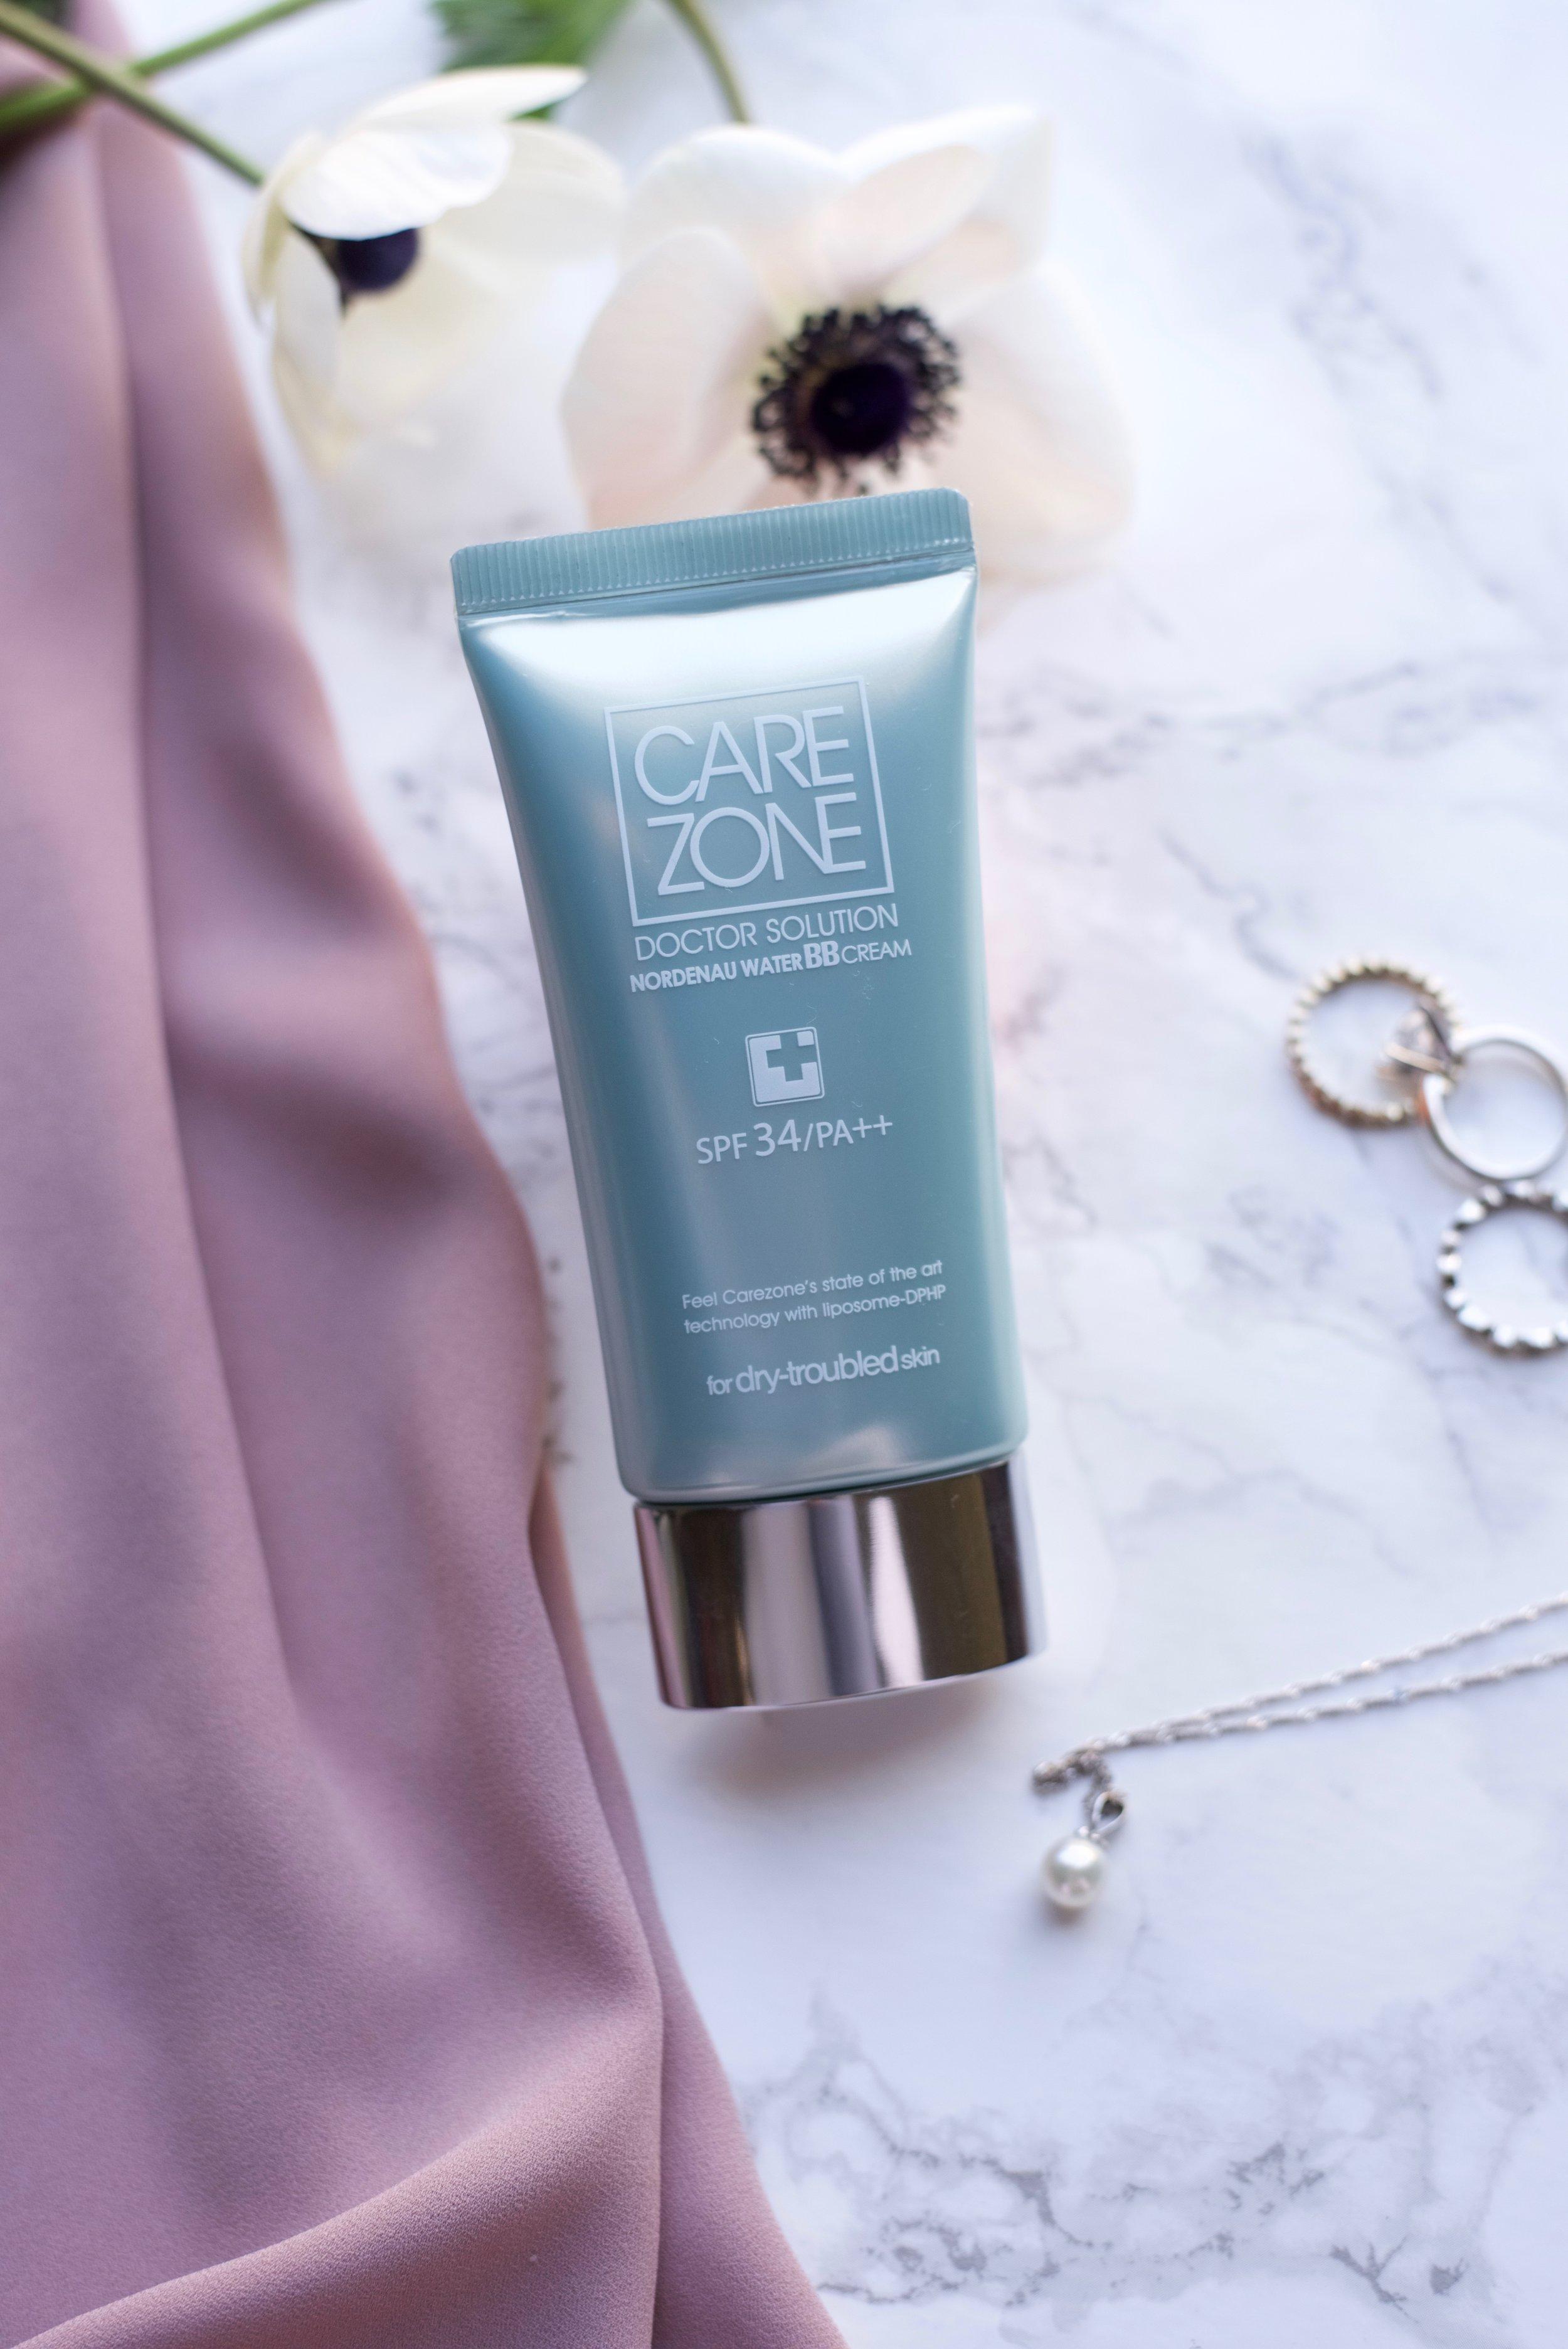 Carezone BB Cream Review